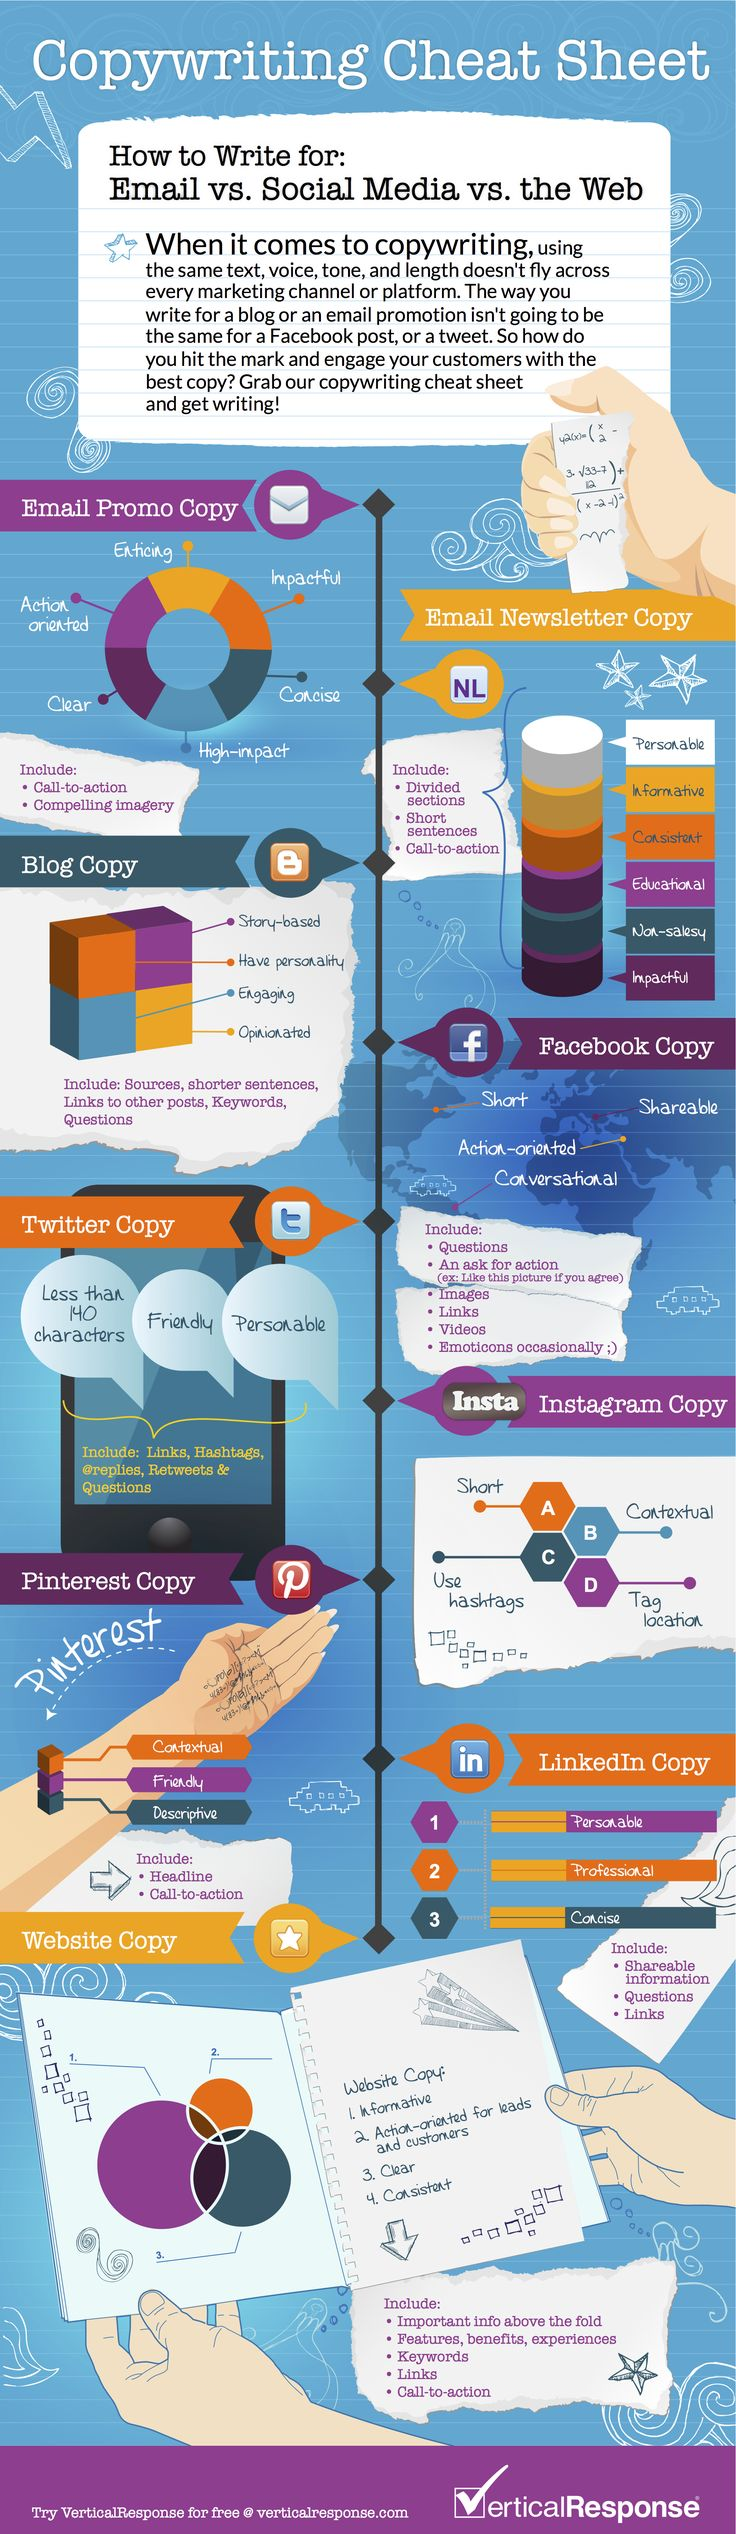 Copywriting Cheat Sheet [Infographic]